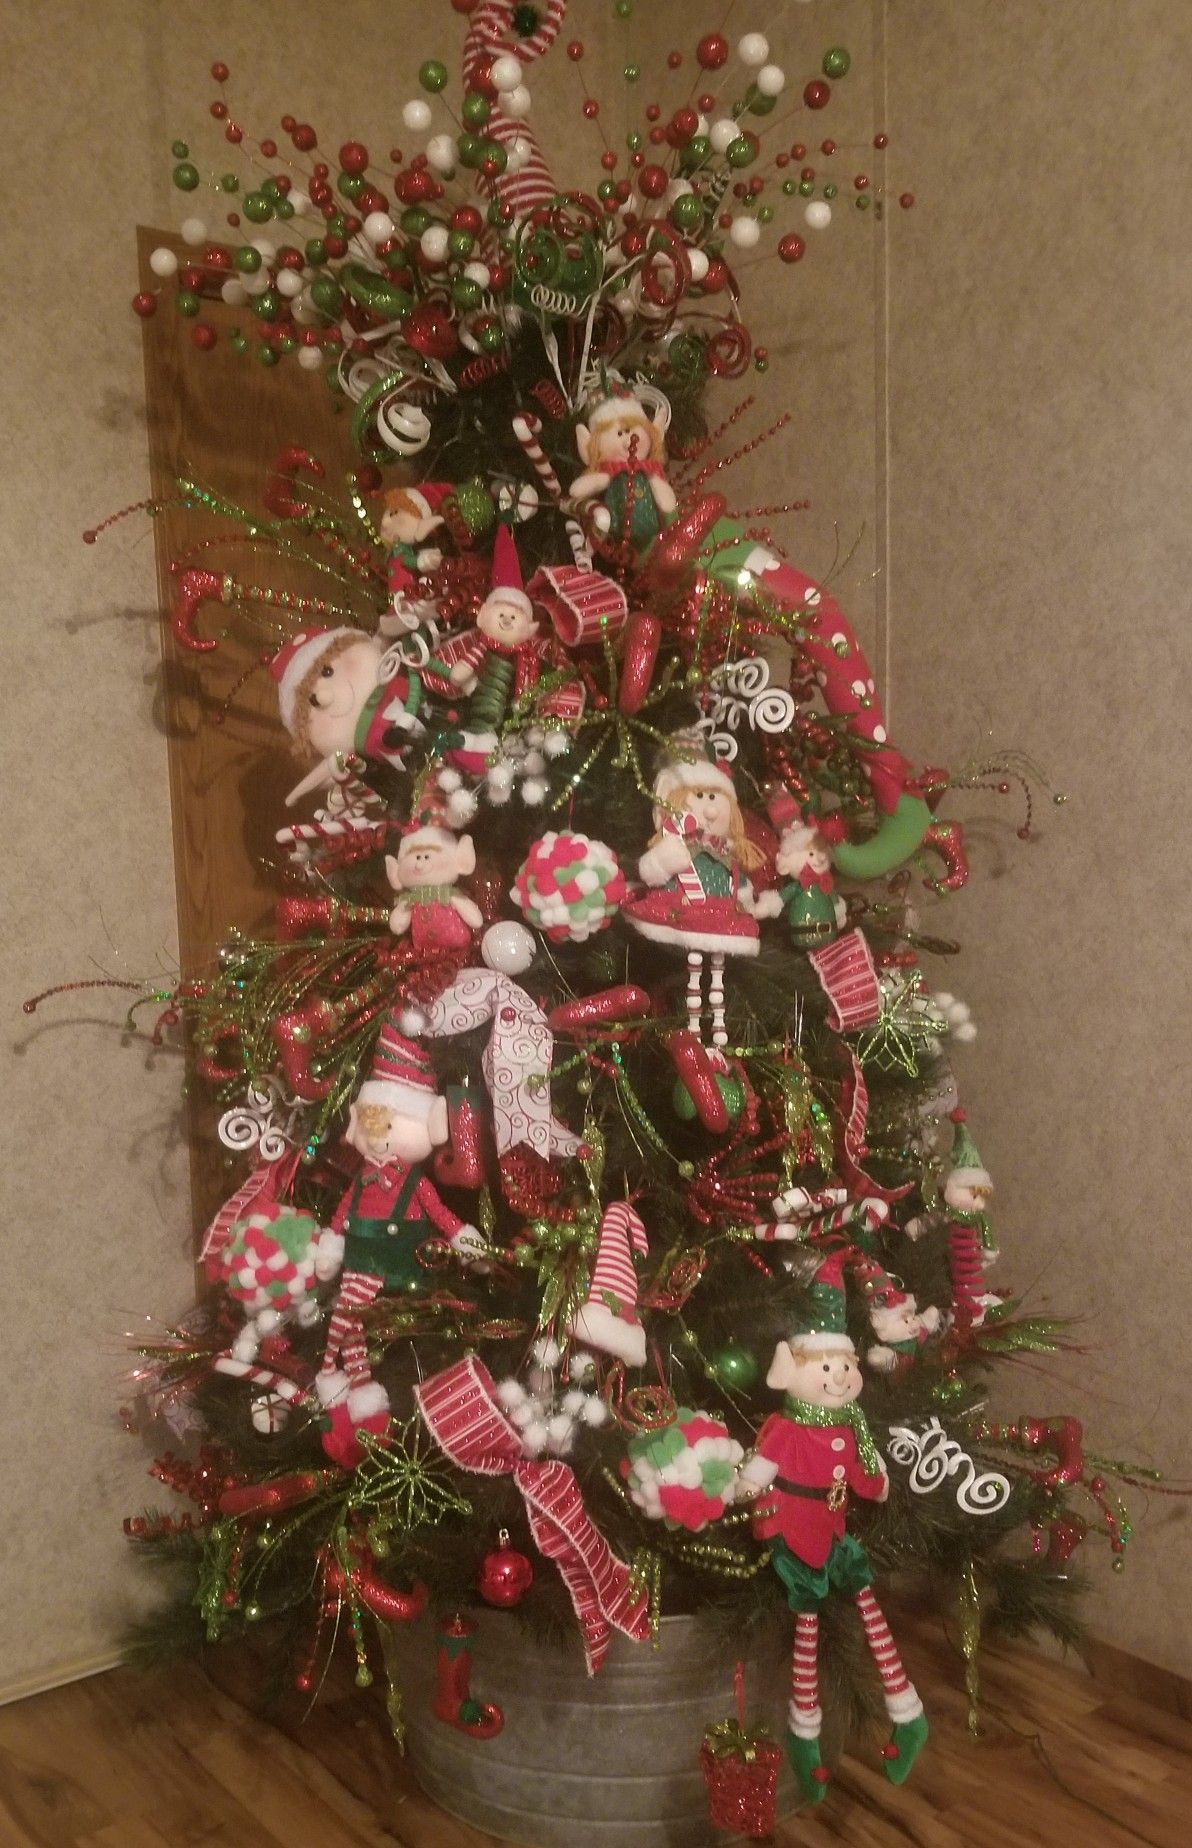 Elf Christmas Tree Elf Christmas Decor Christmas Tree Deco Exchange Picks Kelea S Picks Red Lime Green And W Elf Christmas Tree Christmas Tree Christmas